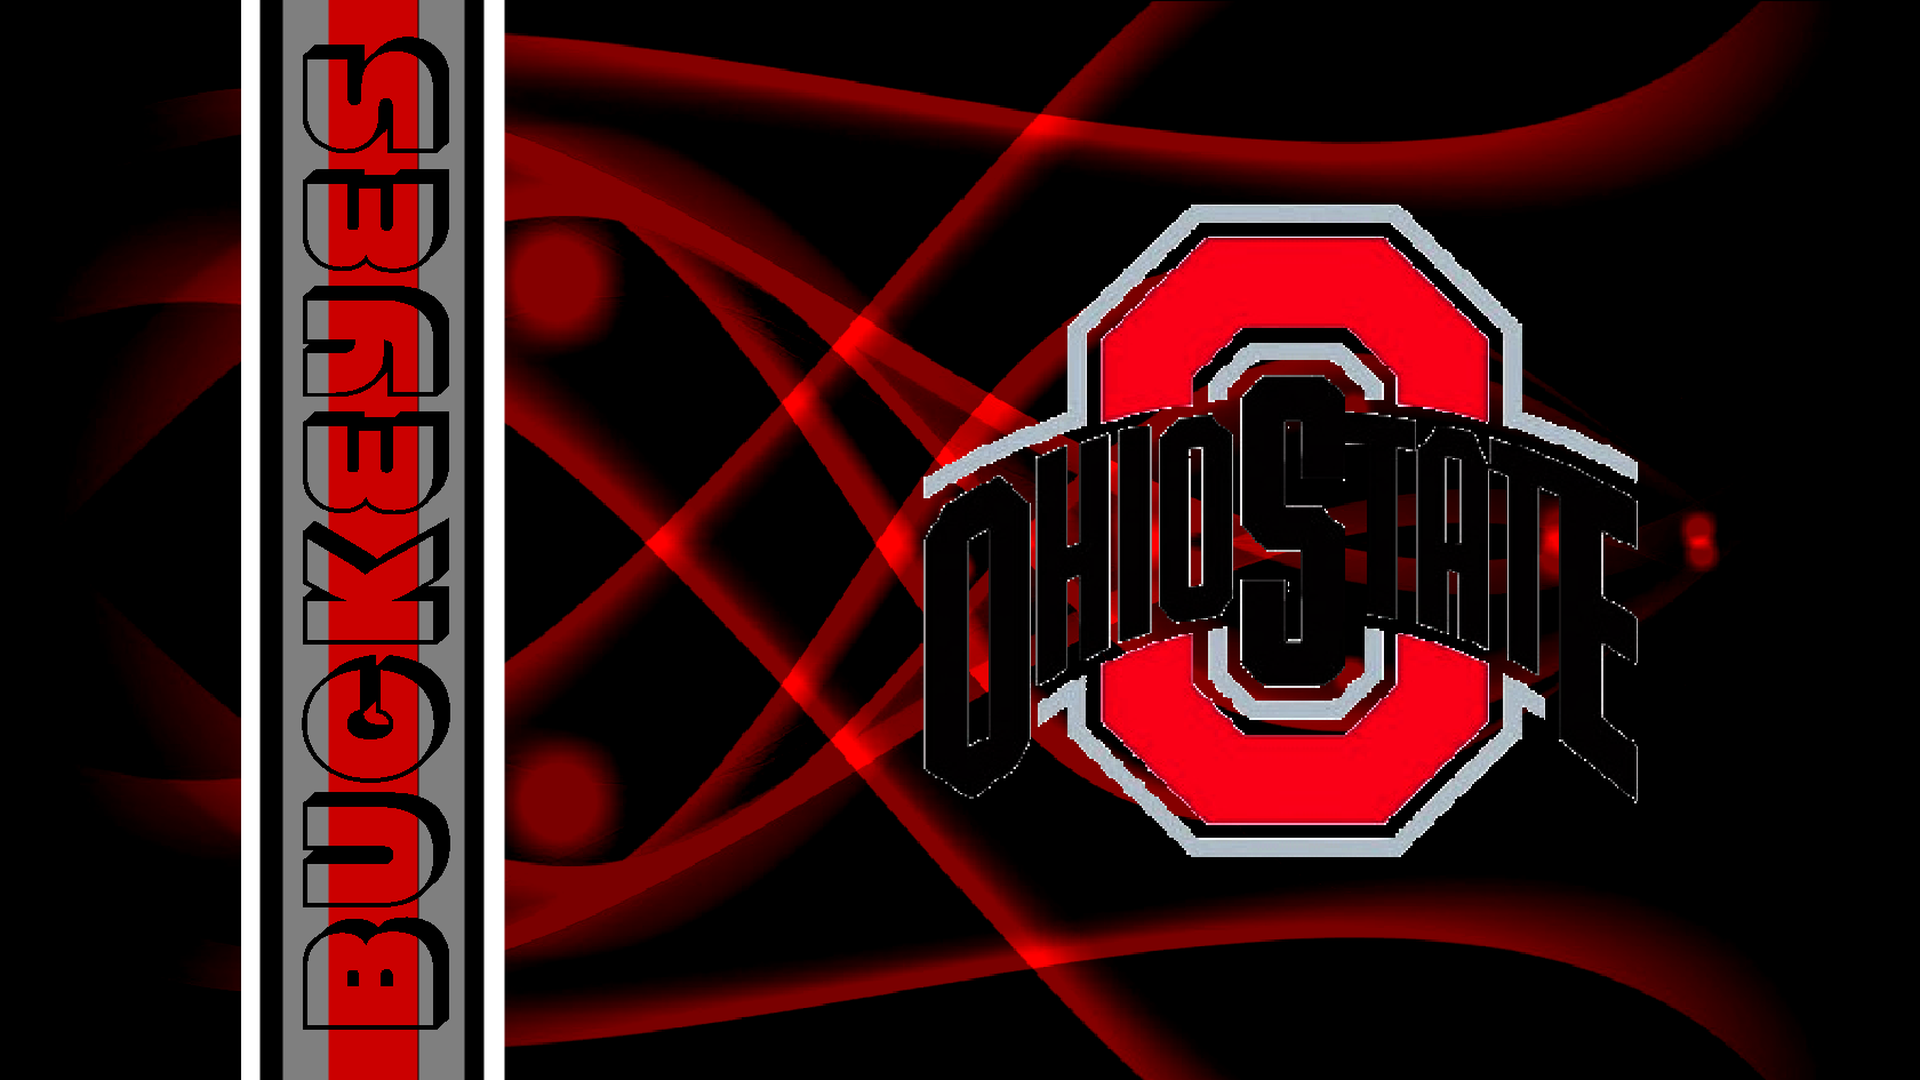 Ohio State Logo Wallpaper: Ohio State University Wallpaper